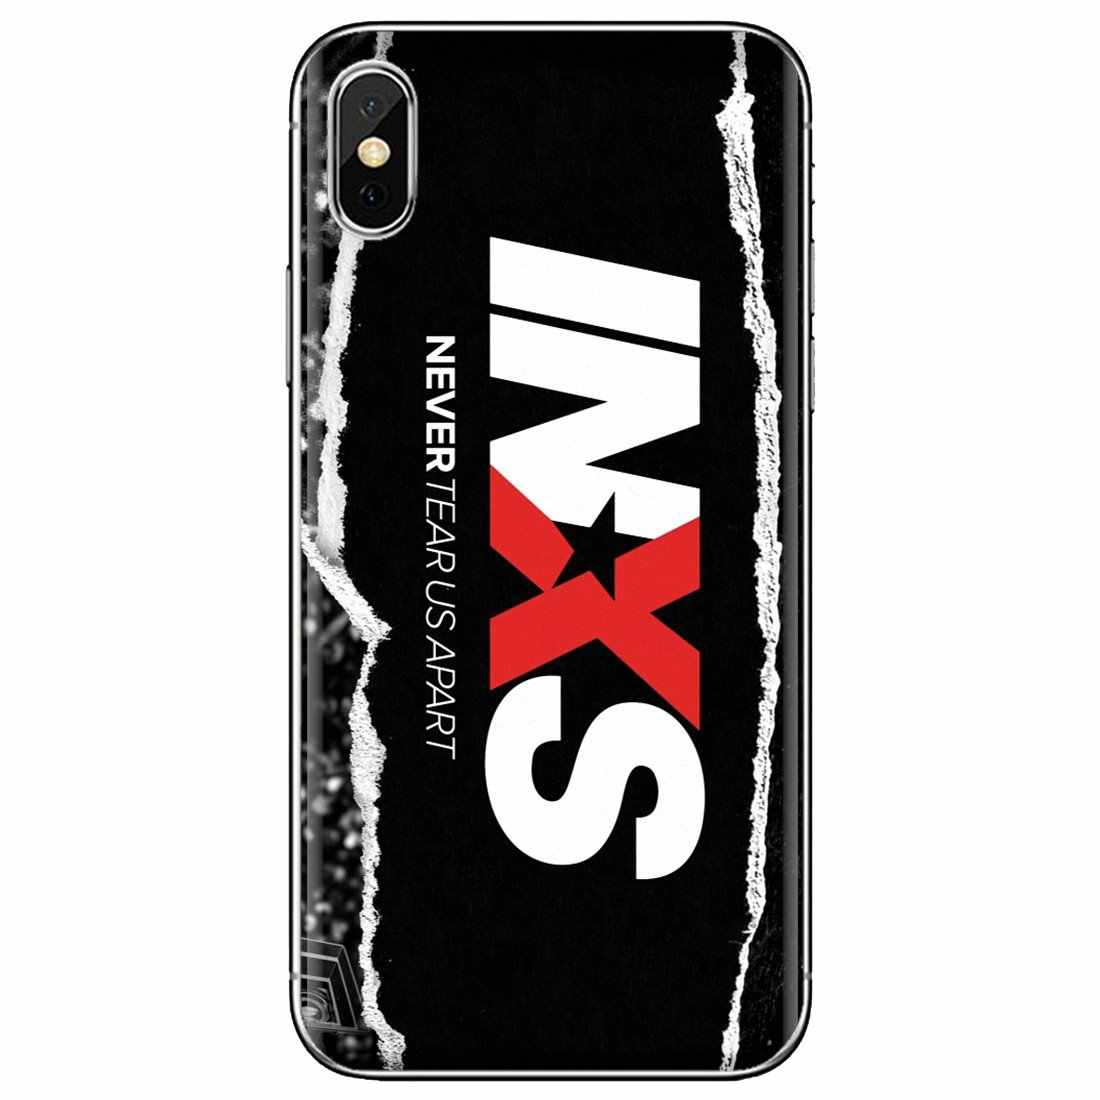 INXS avustralya Punk Pop FOTL zil Logo silikon kapak için BQ Aquaris C U2 a z a k a z a k a z a k a z a k a z a k X2 X Lite pro artı E4.5 M4.5 X5 E5 4G M 2017